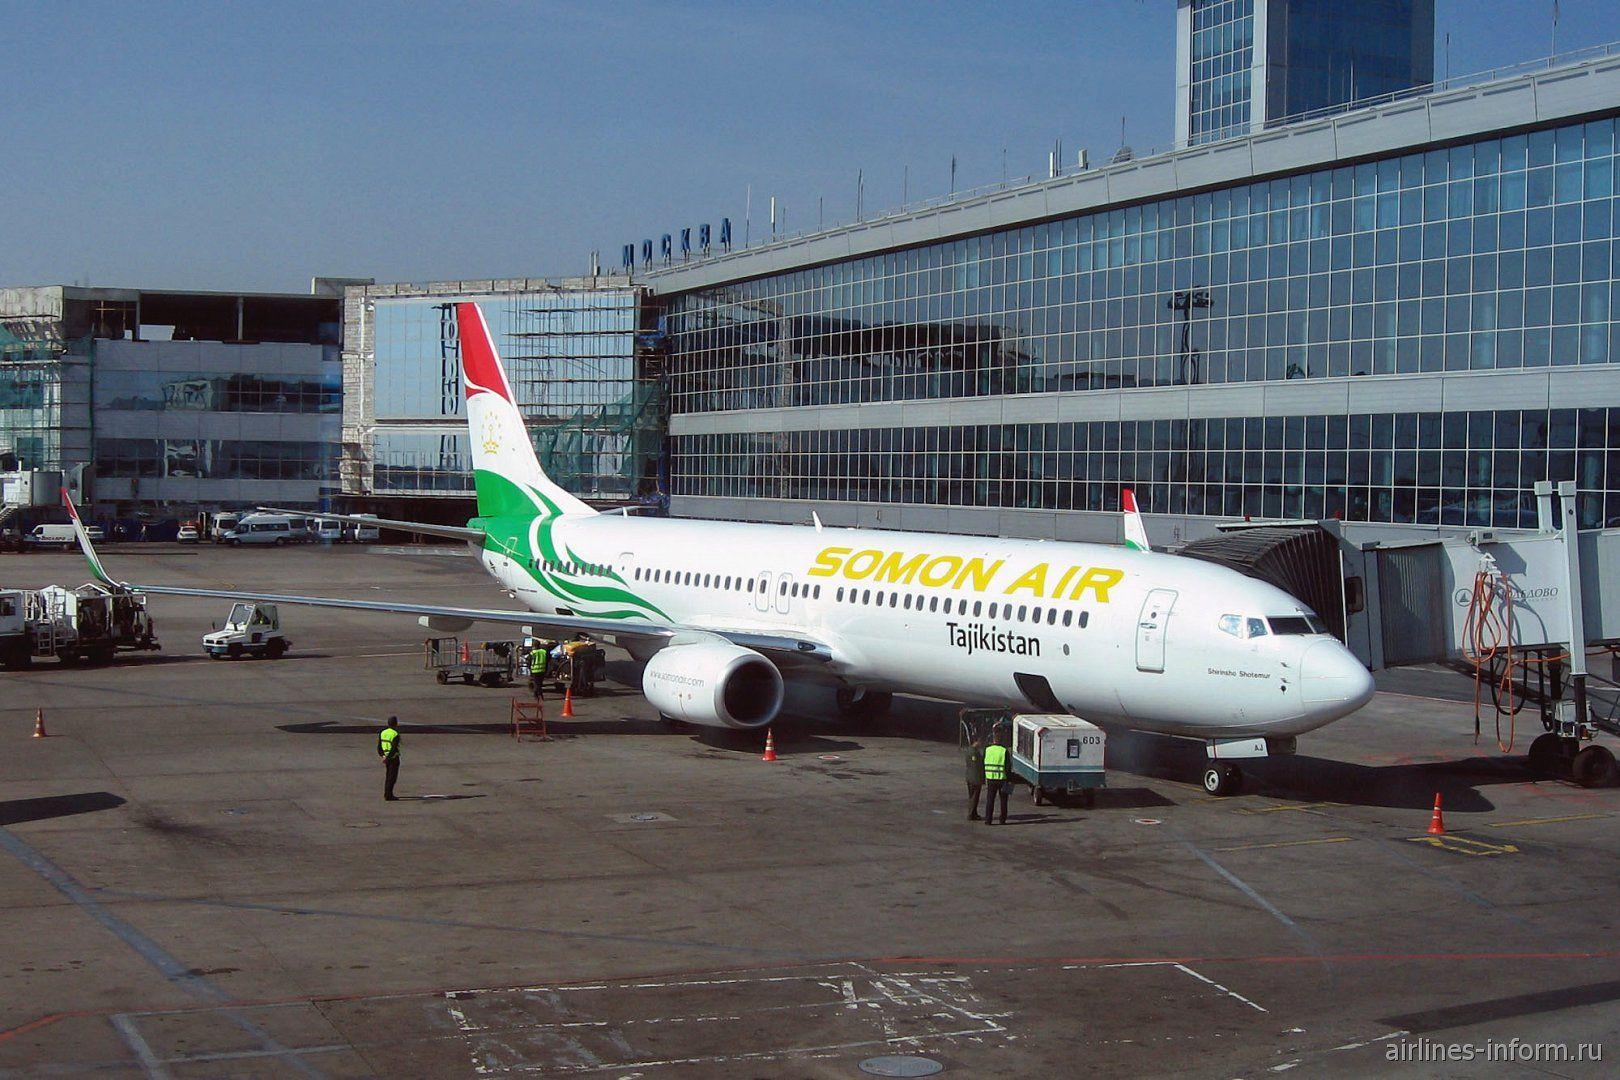 Таджикистан картинки самолеты